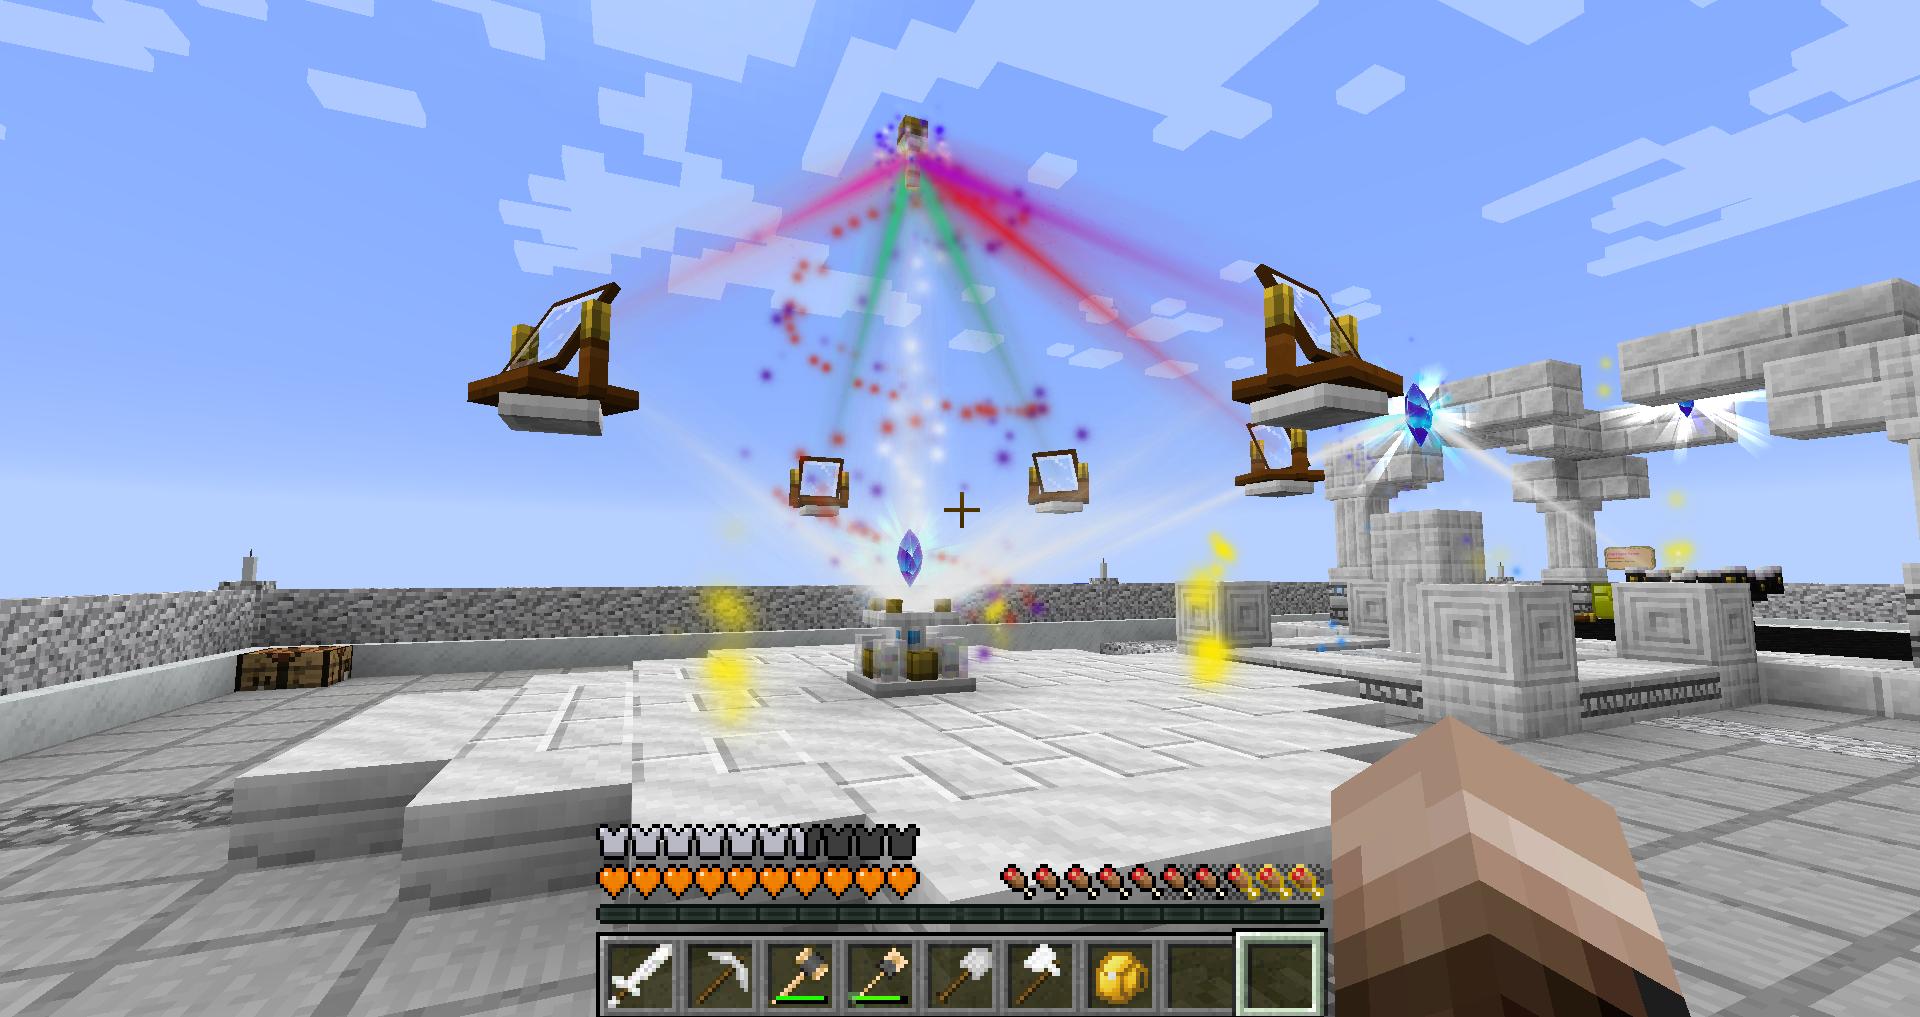 Crystal beams not showing · Issue #413 · HellFirePvP